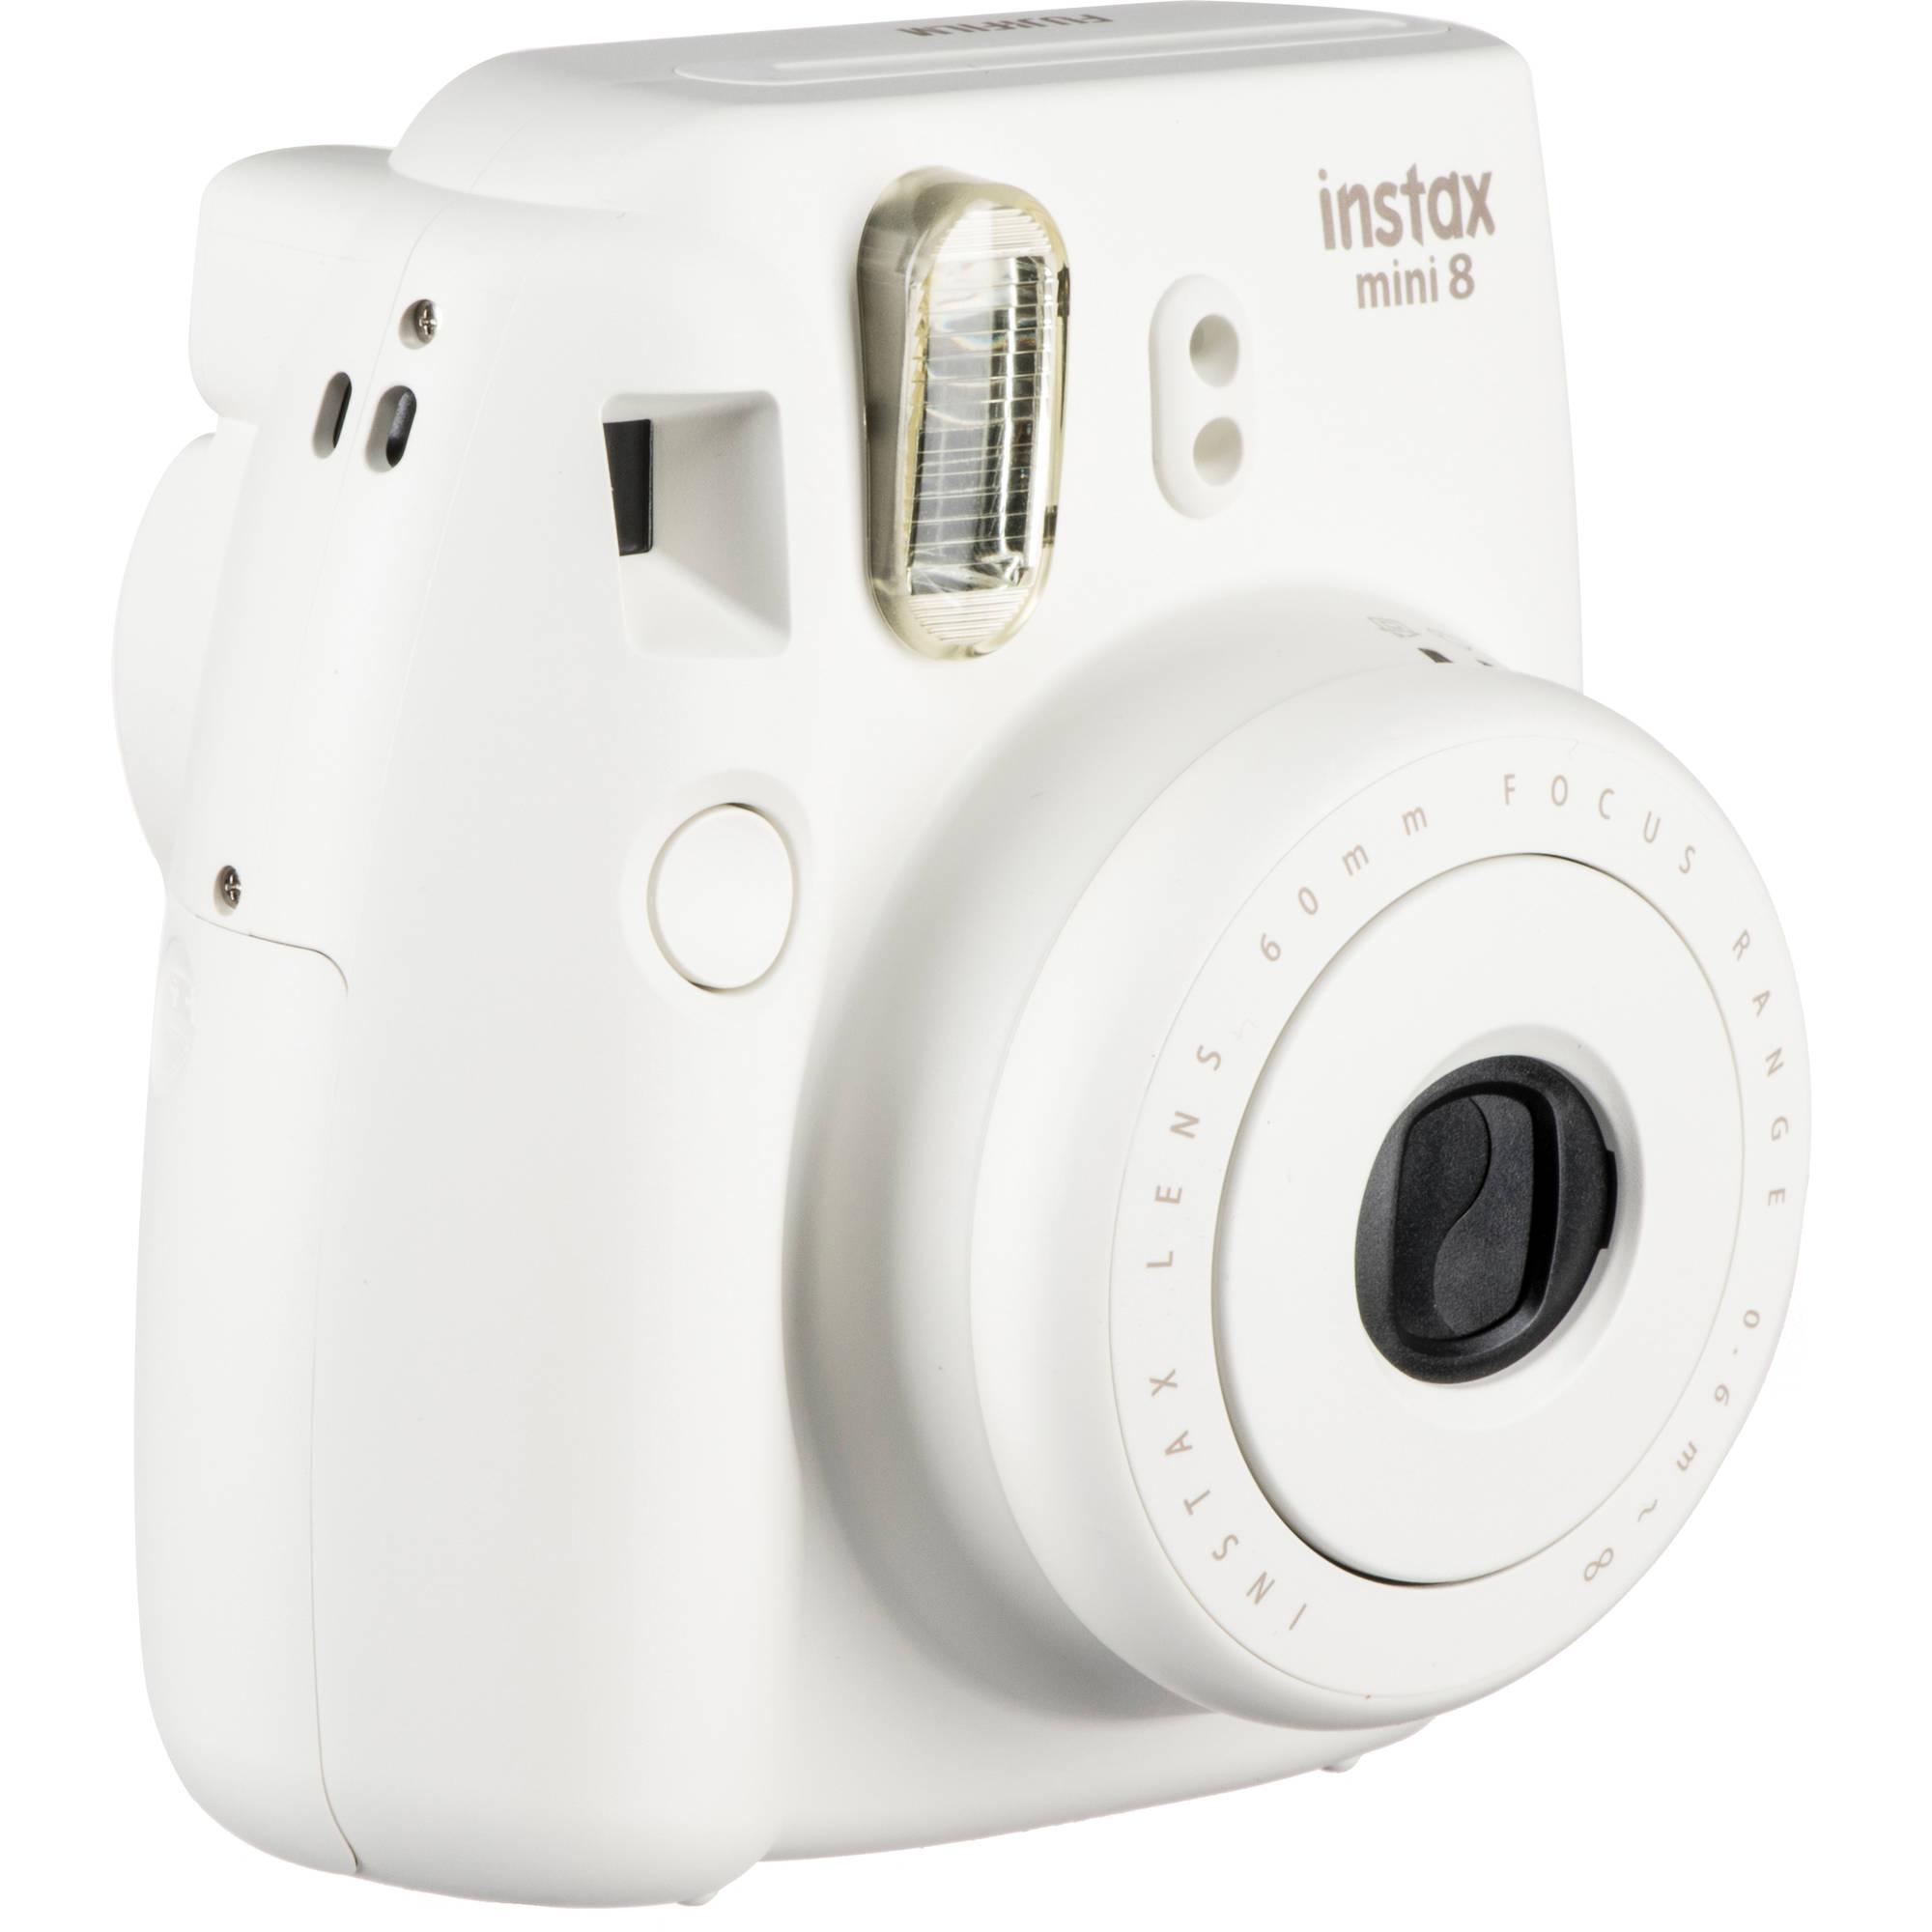 Fujifilm instax mini 8 instant film camera white for Instax mini 8 housse